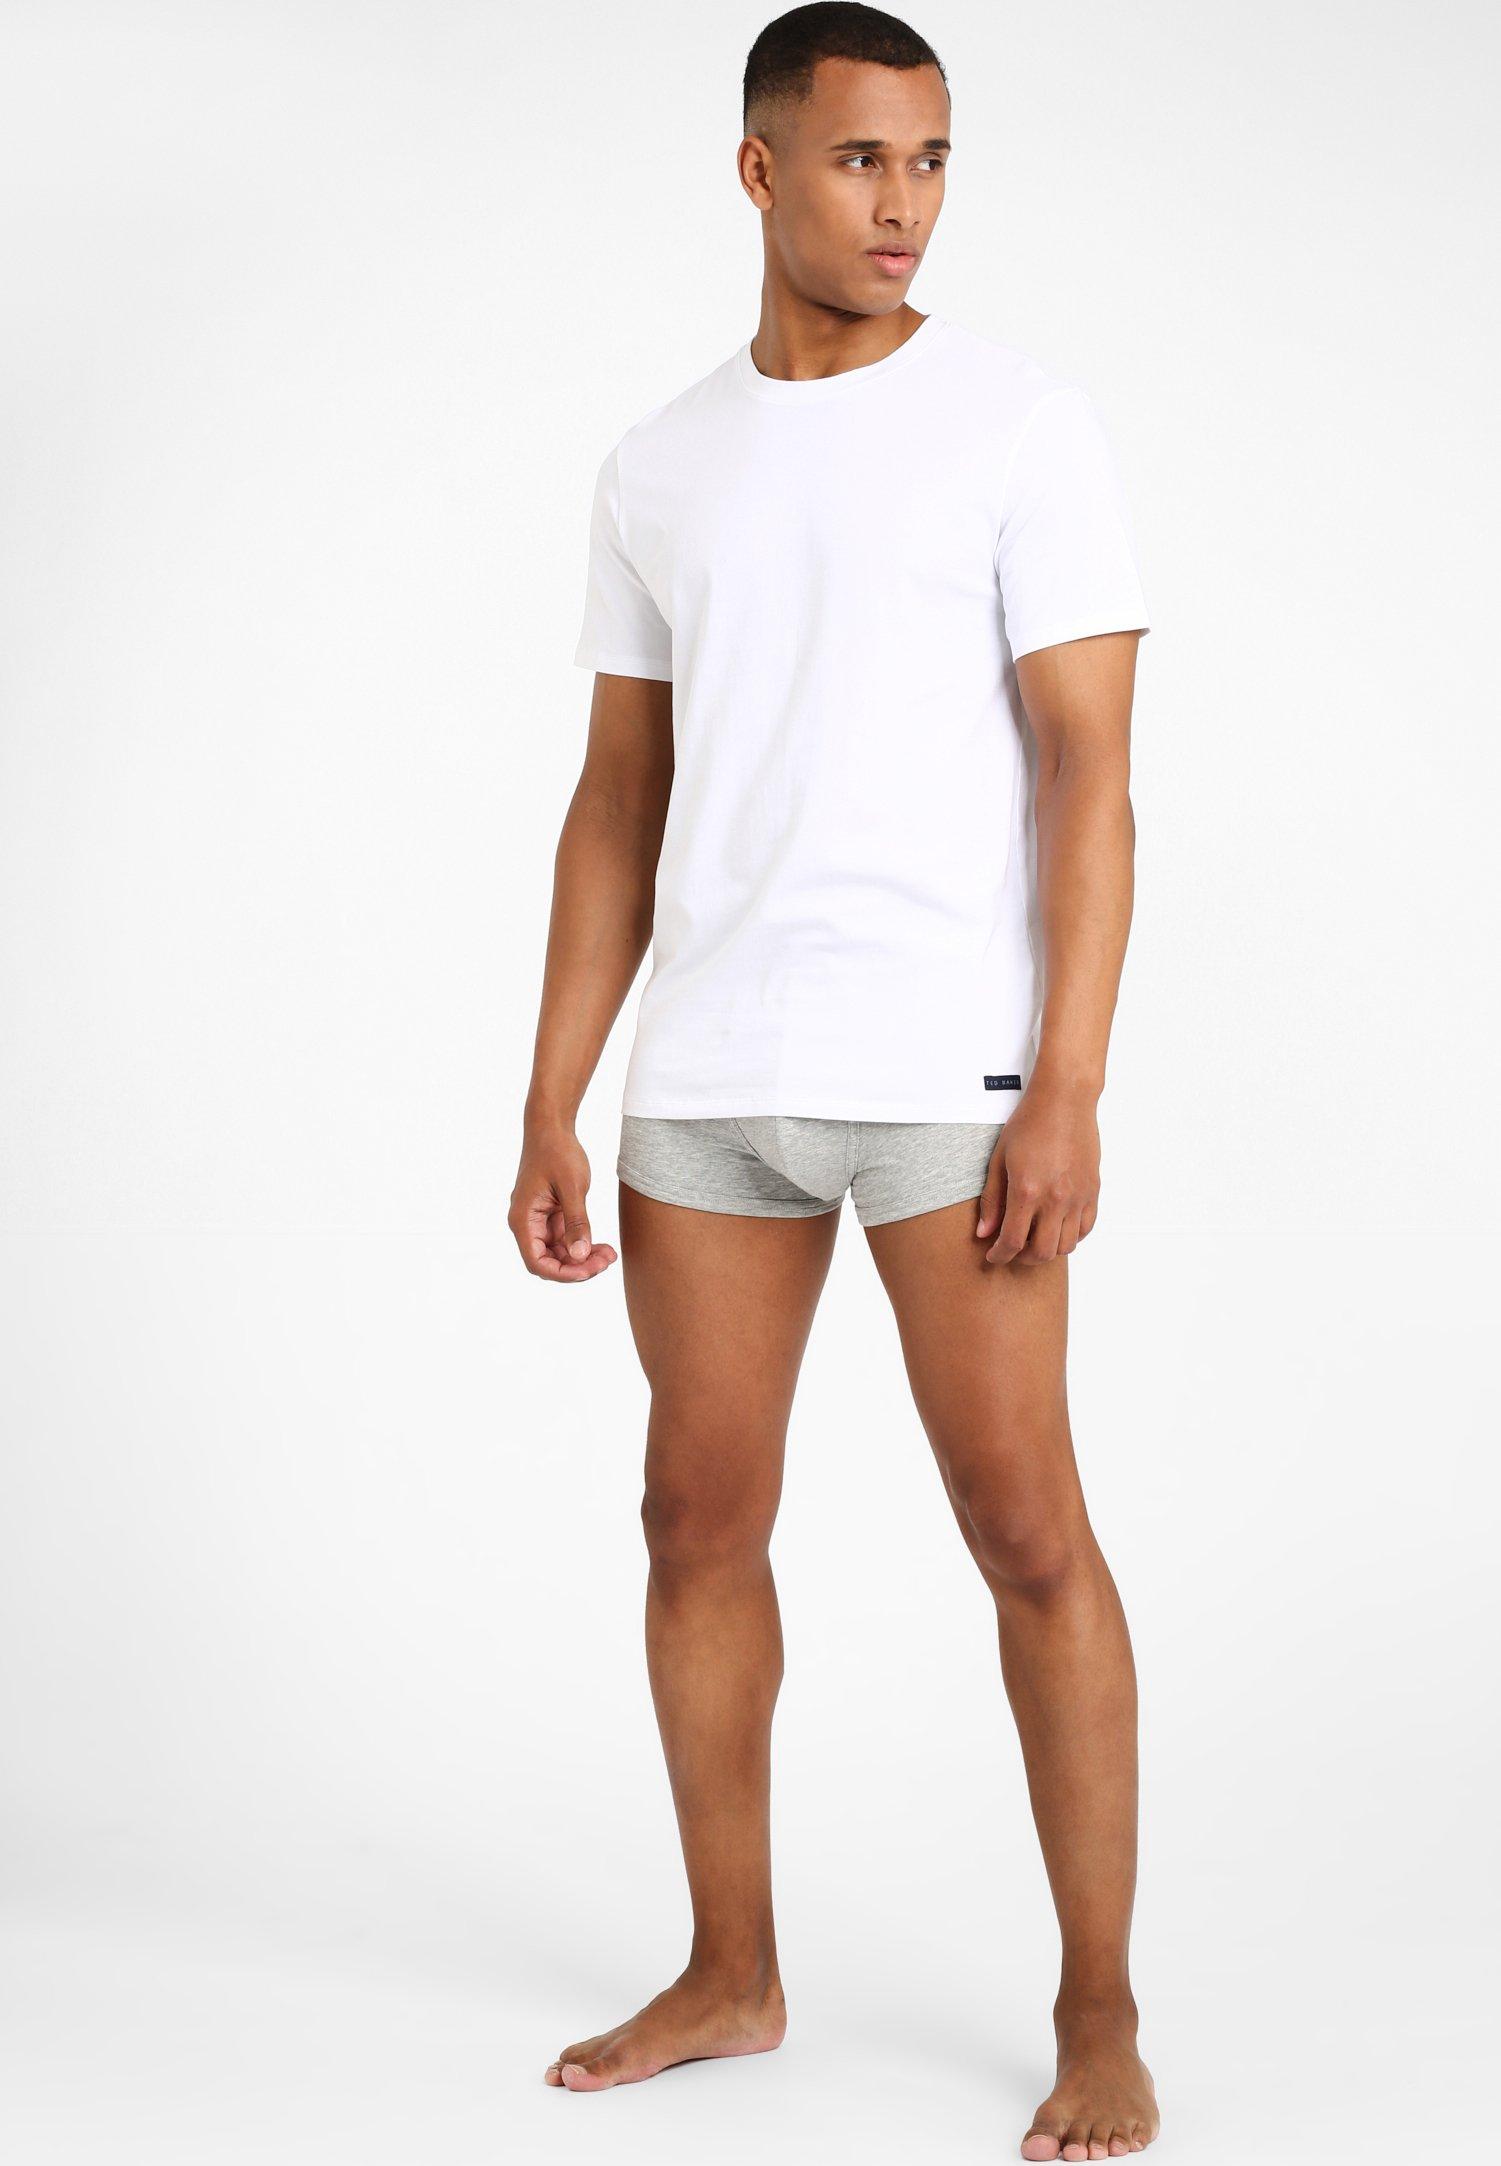 Herren 3 PACK - Unterhemd/-shirt